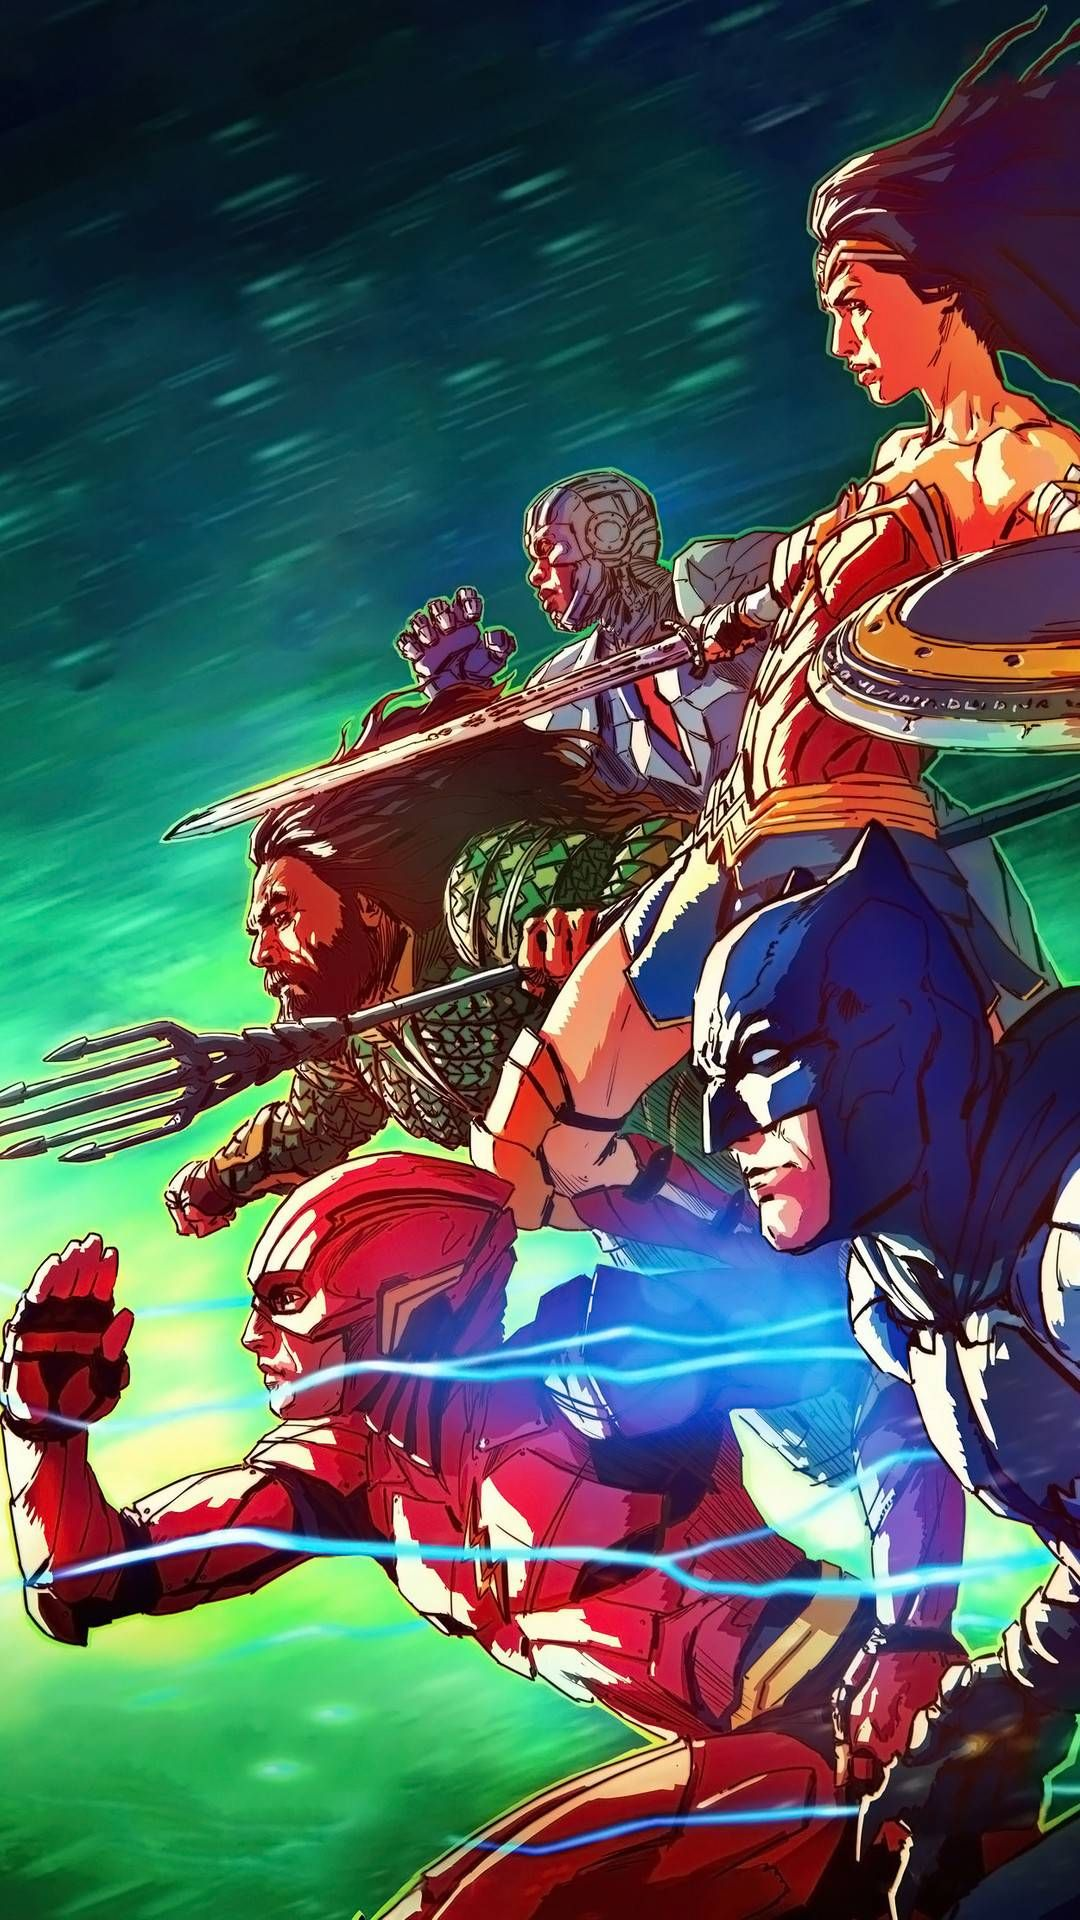 Justice League Art Iphone Wallpaper Superhero Wallpaper Justice League Art Justice League